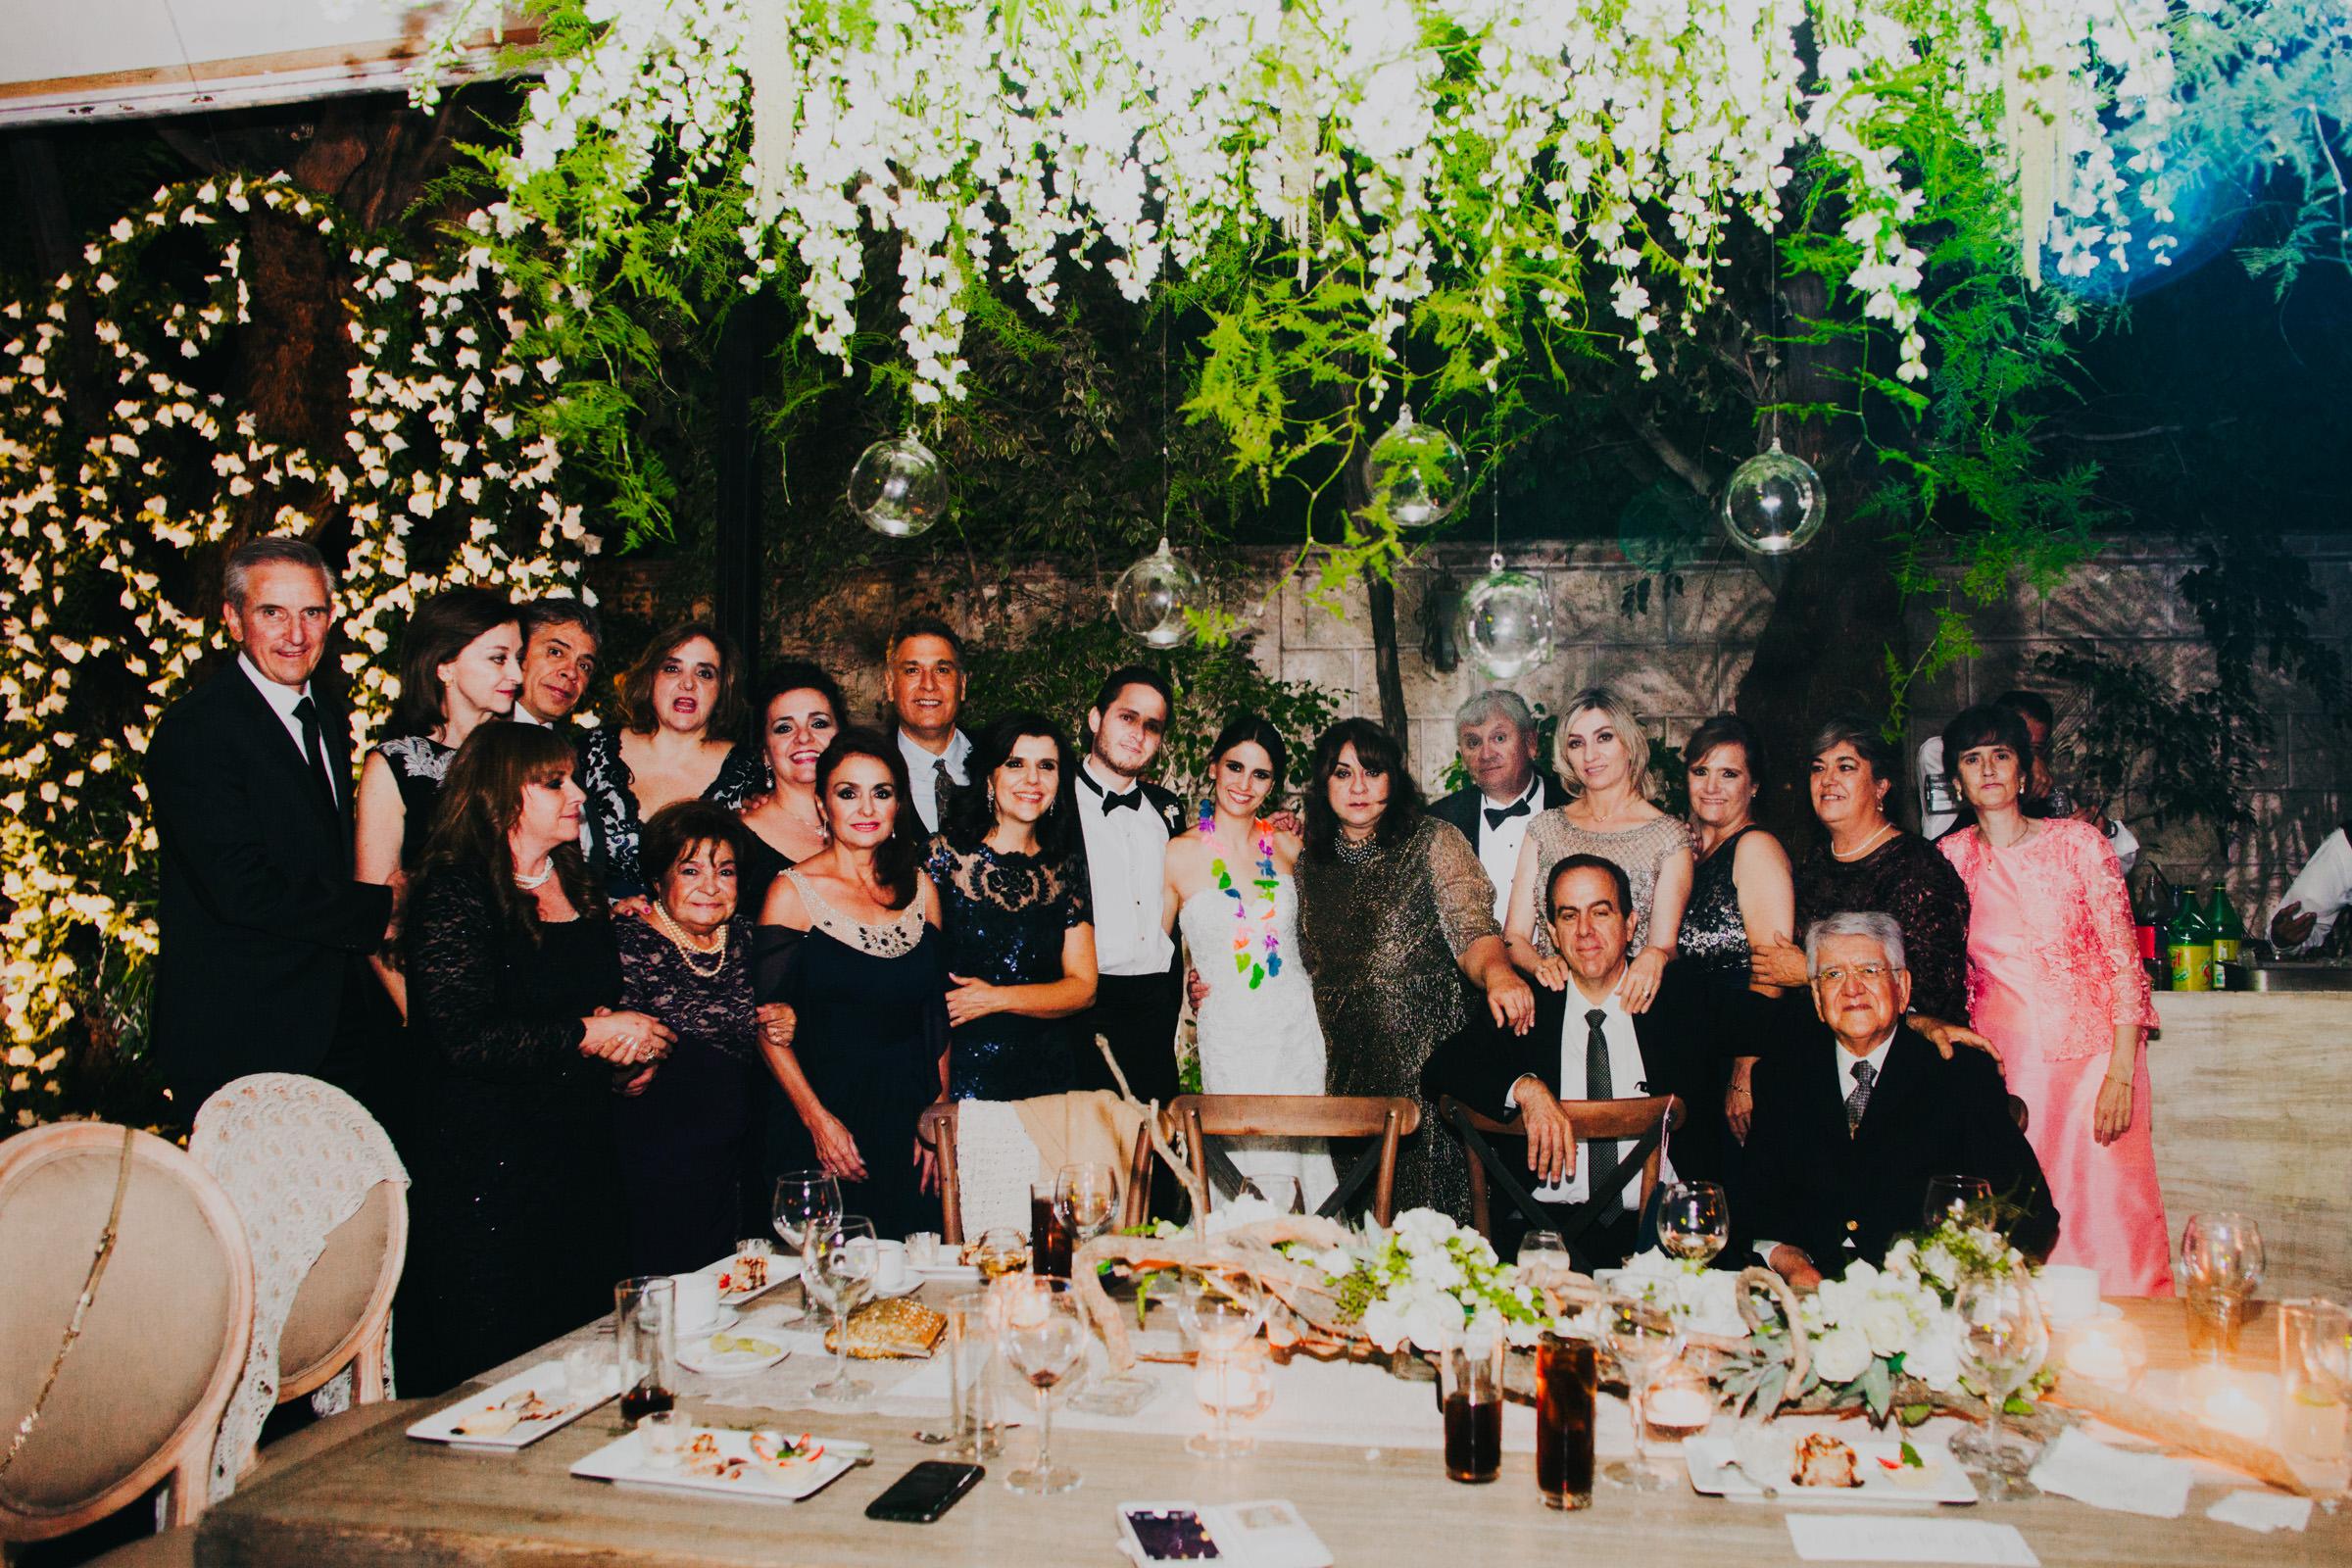 irapuato-boda-fotografia-jardines-alcalde-guanajuato-paulina-juan-pedro--151.jpg